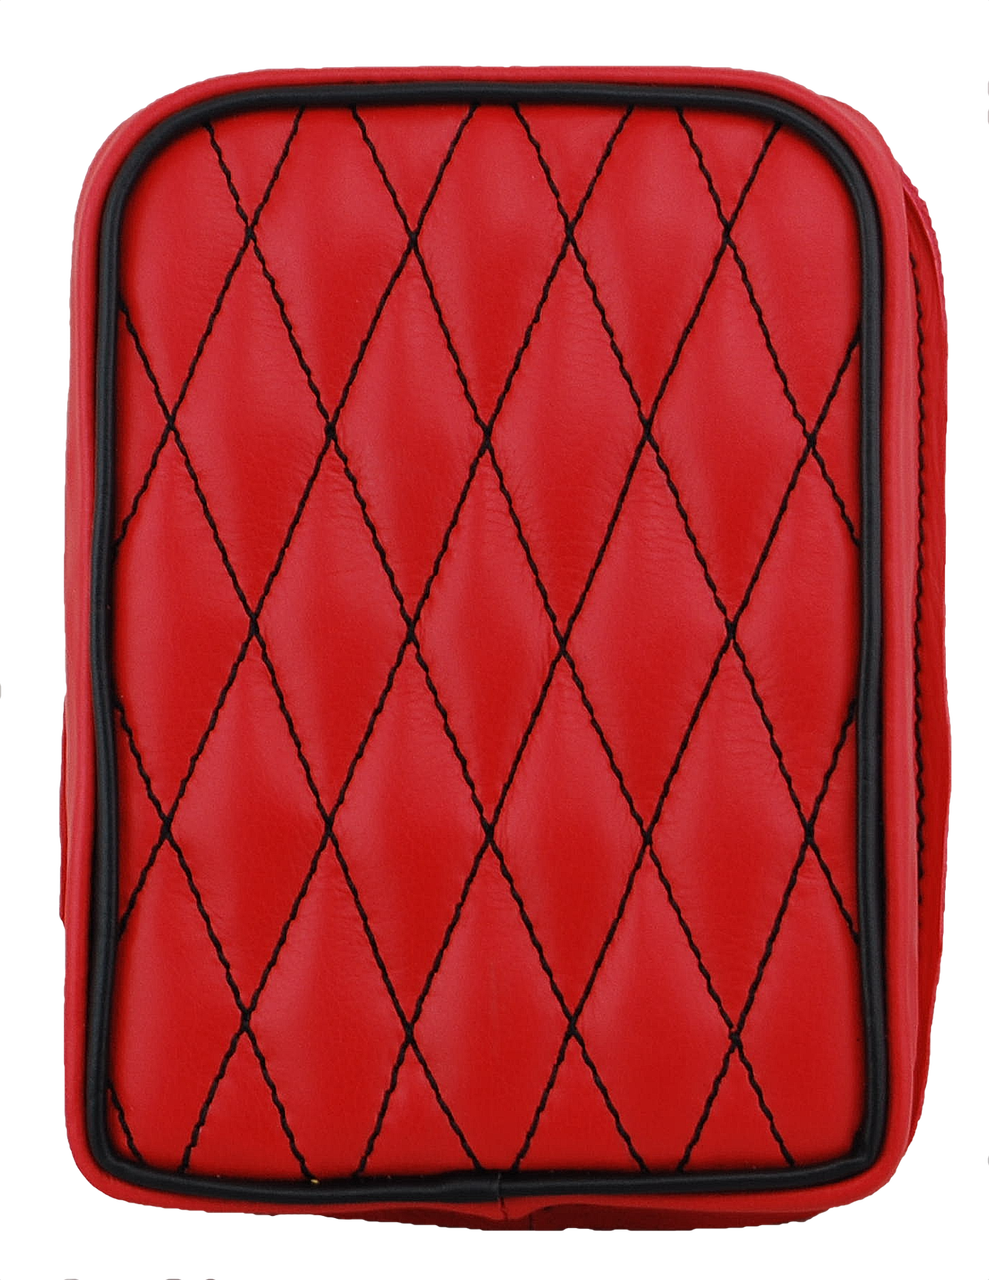 Universal Rear Passenger Pillion Pad Red Diamond Tuk With Black Accents